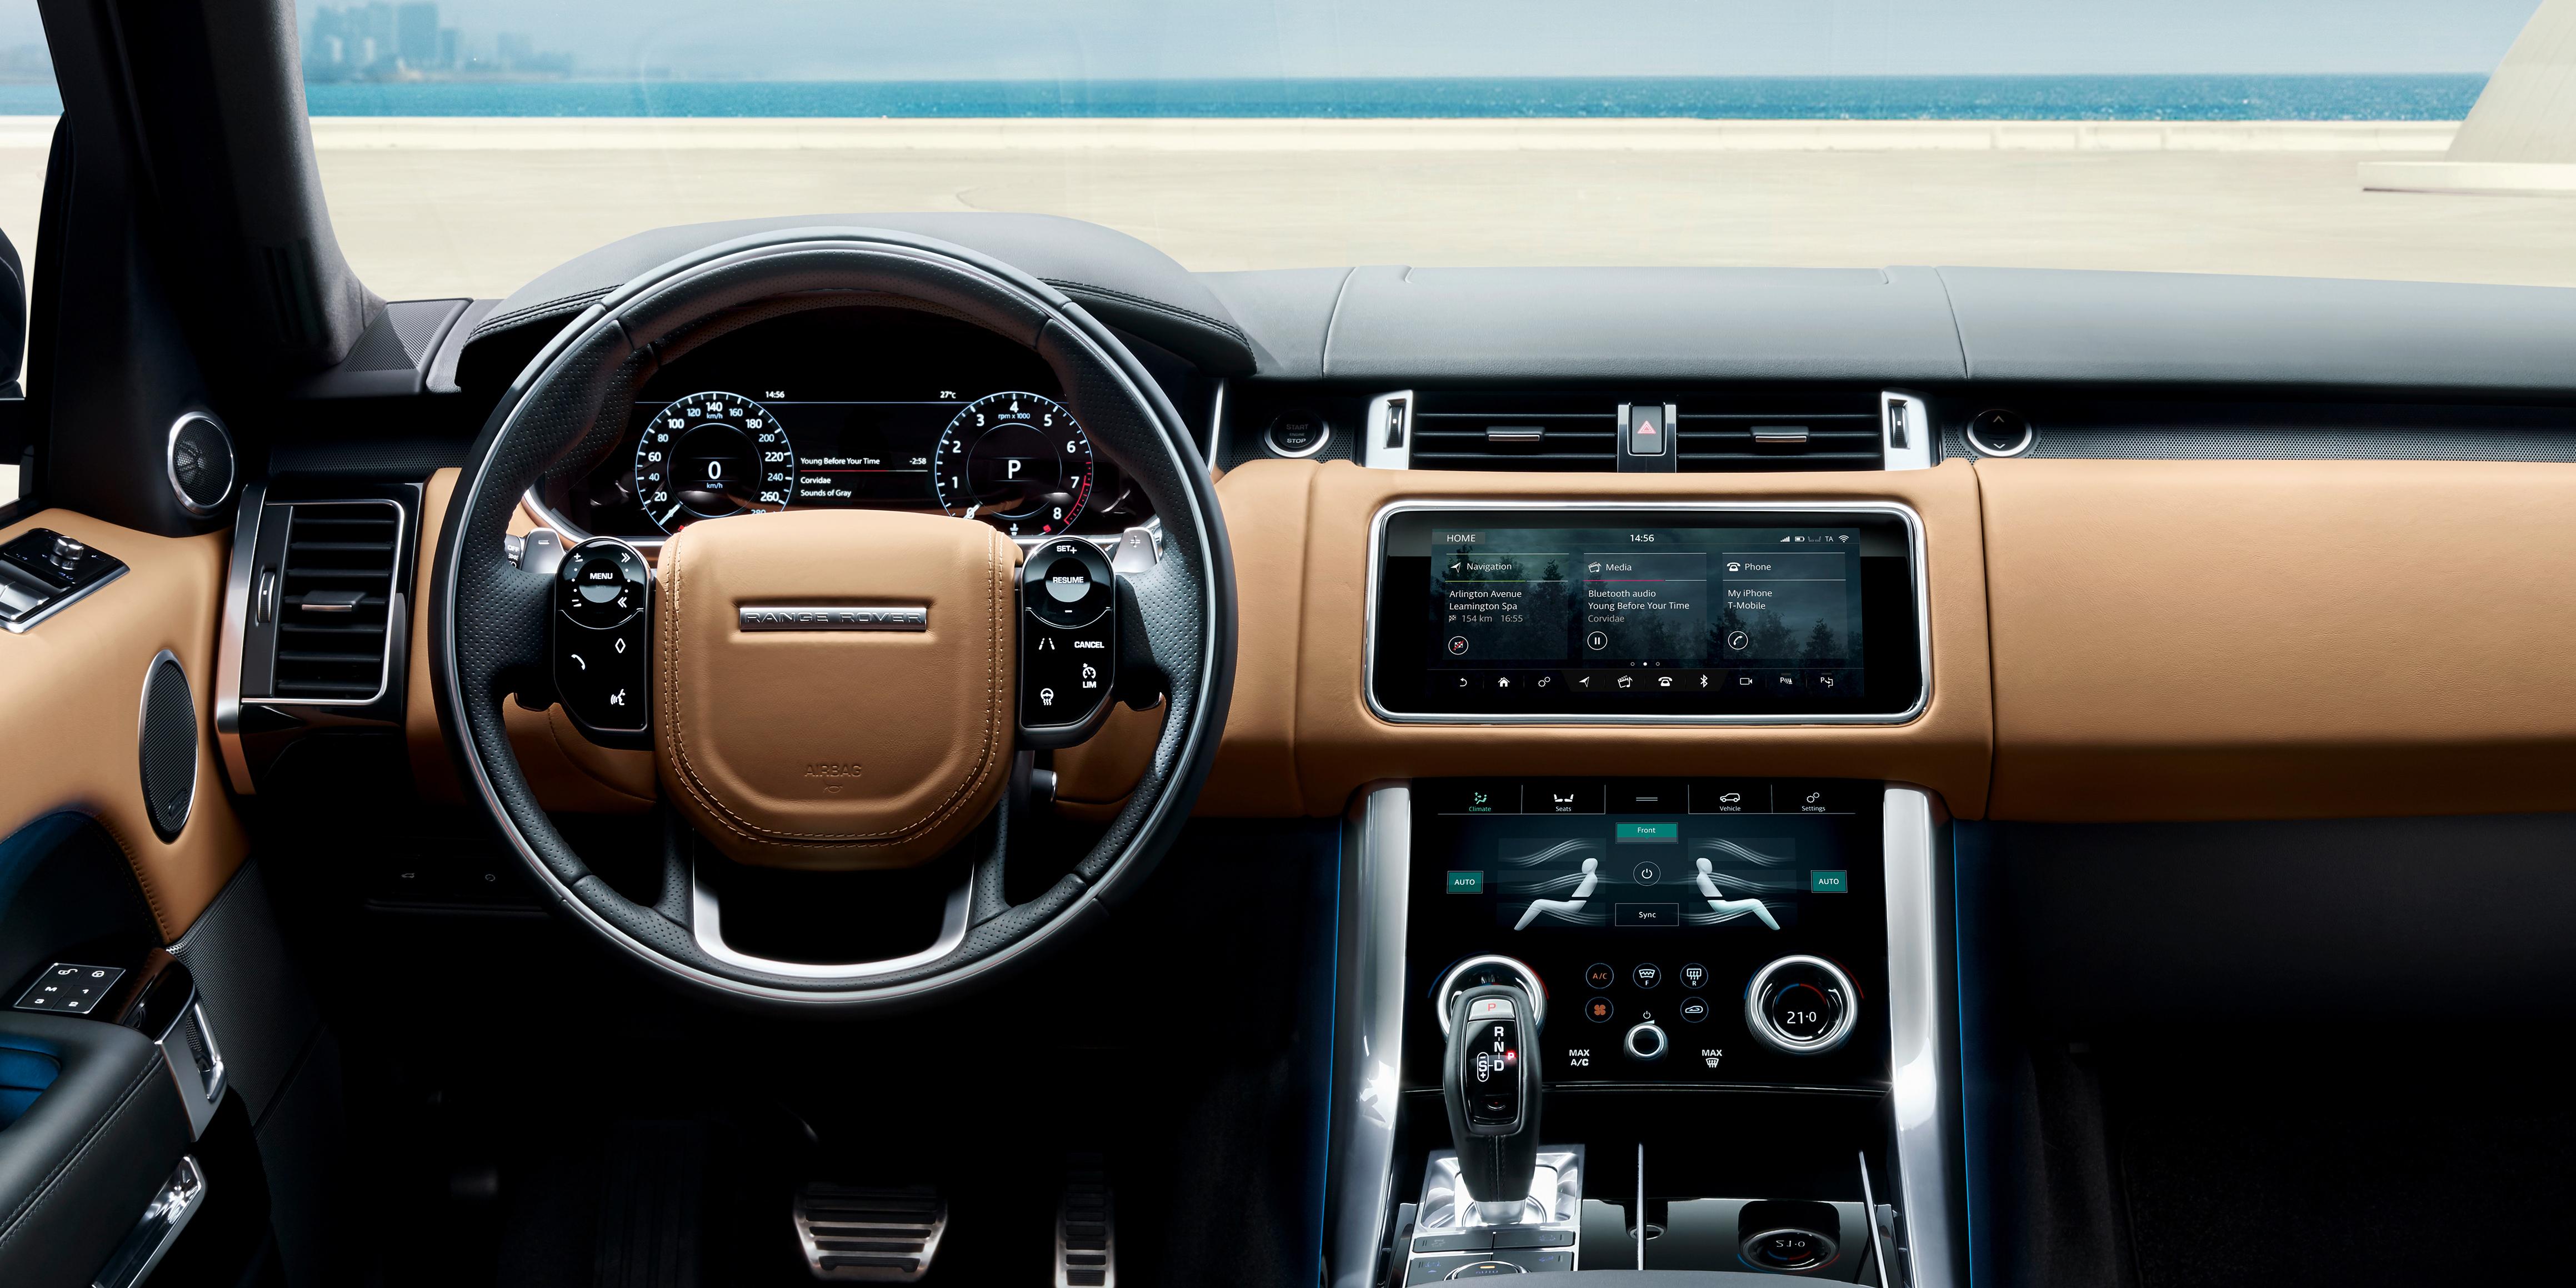 Range Rover Sport Interior >> Land Rover Range Rover Sport Interior Infotainment Carwow